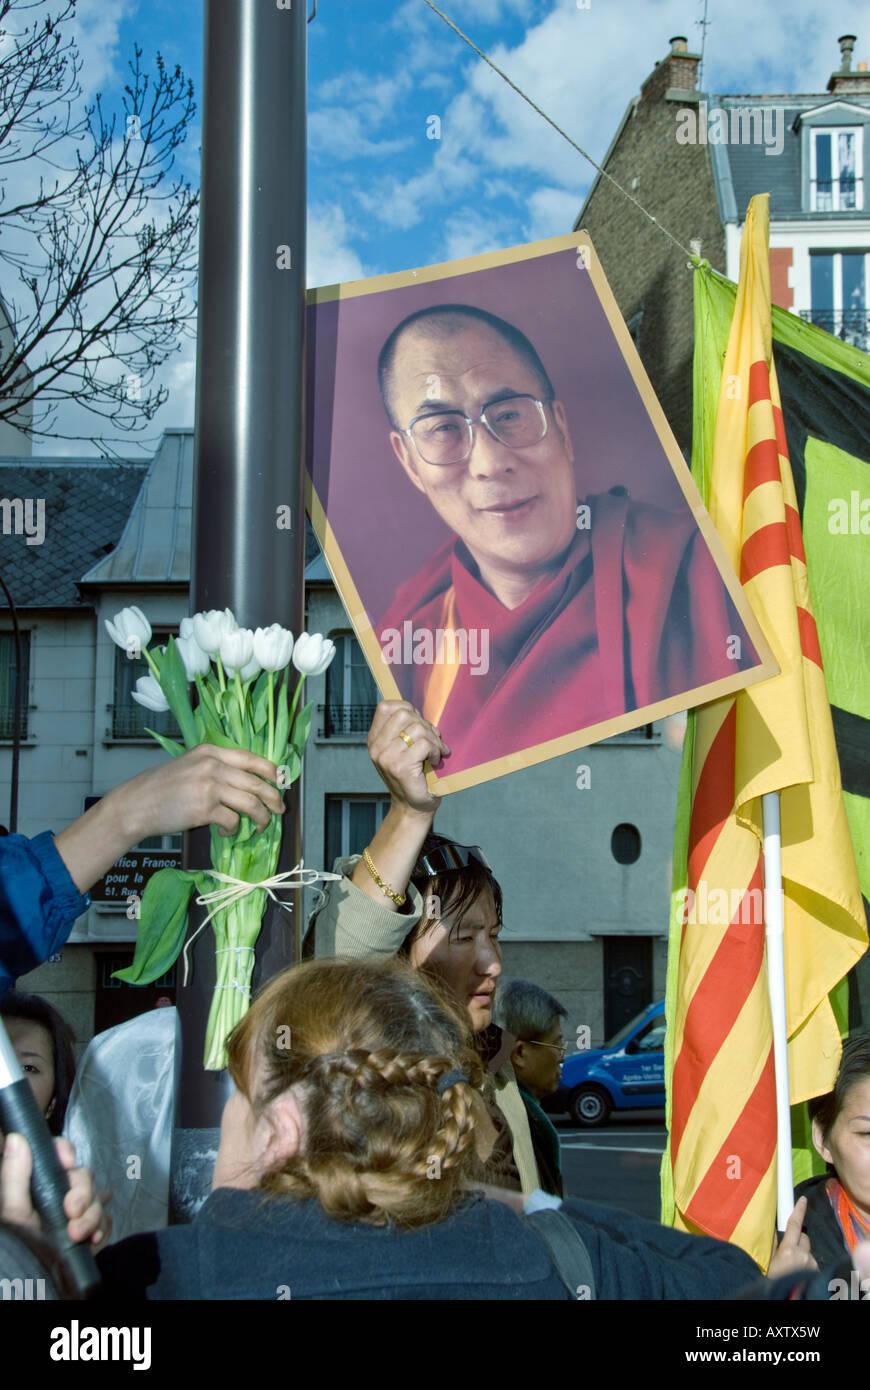 Paris FRANCE, 'Tibet Demonstration' by Tibetan Immigrants 'Day for Tibet' Holding 'Dalai Lama' - Stock Image